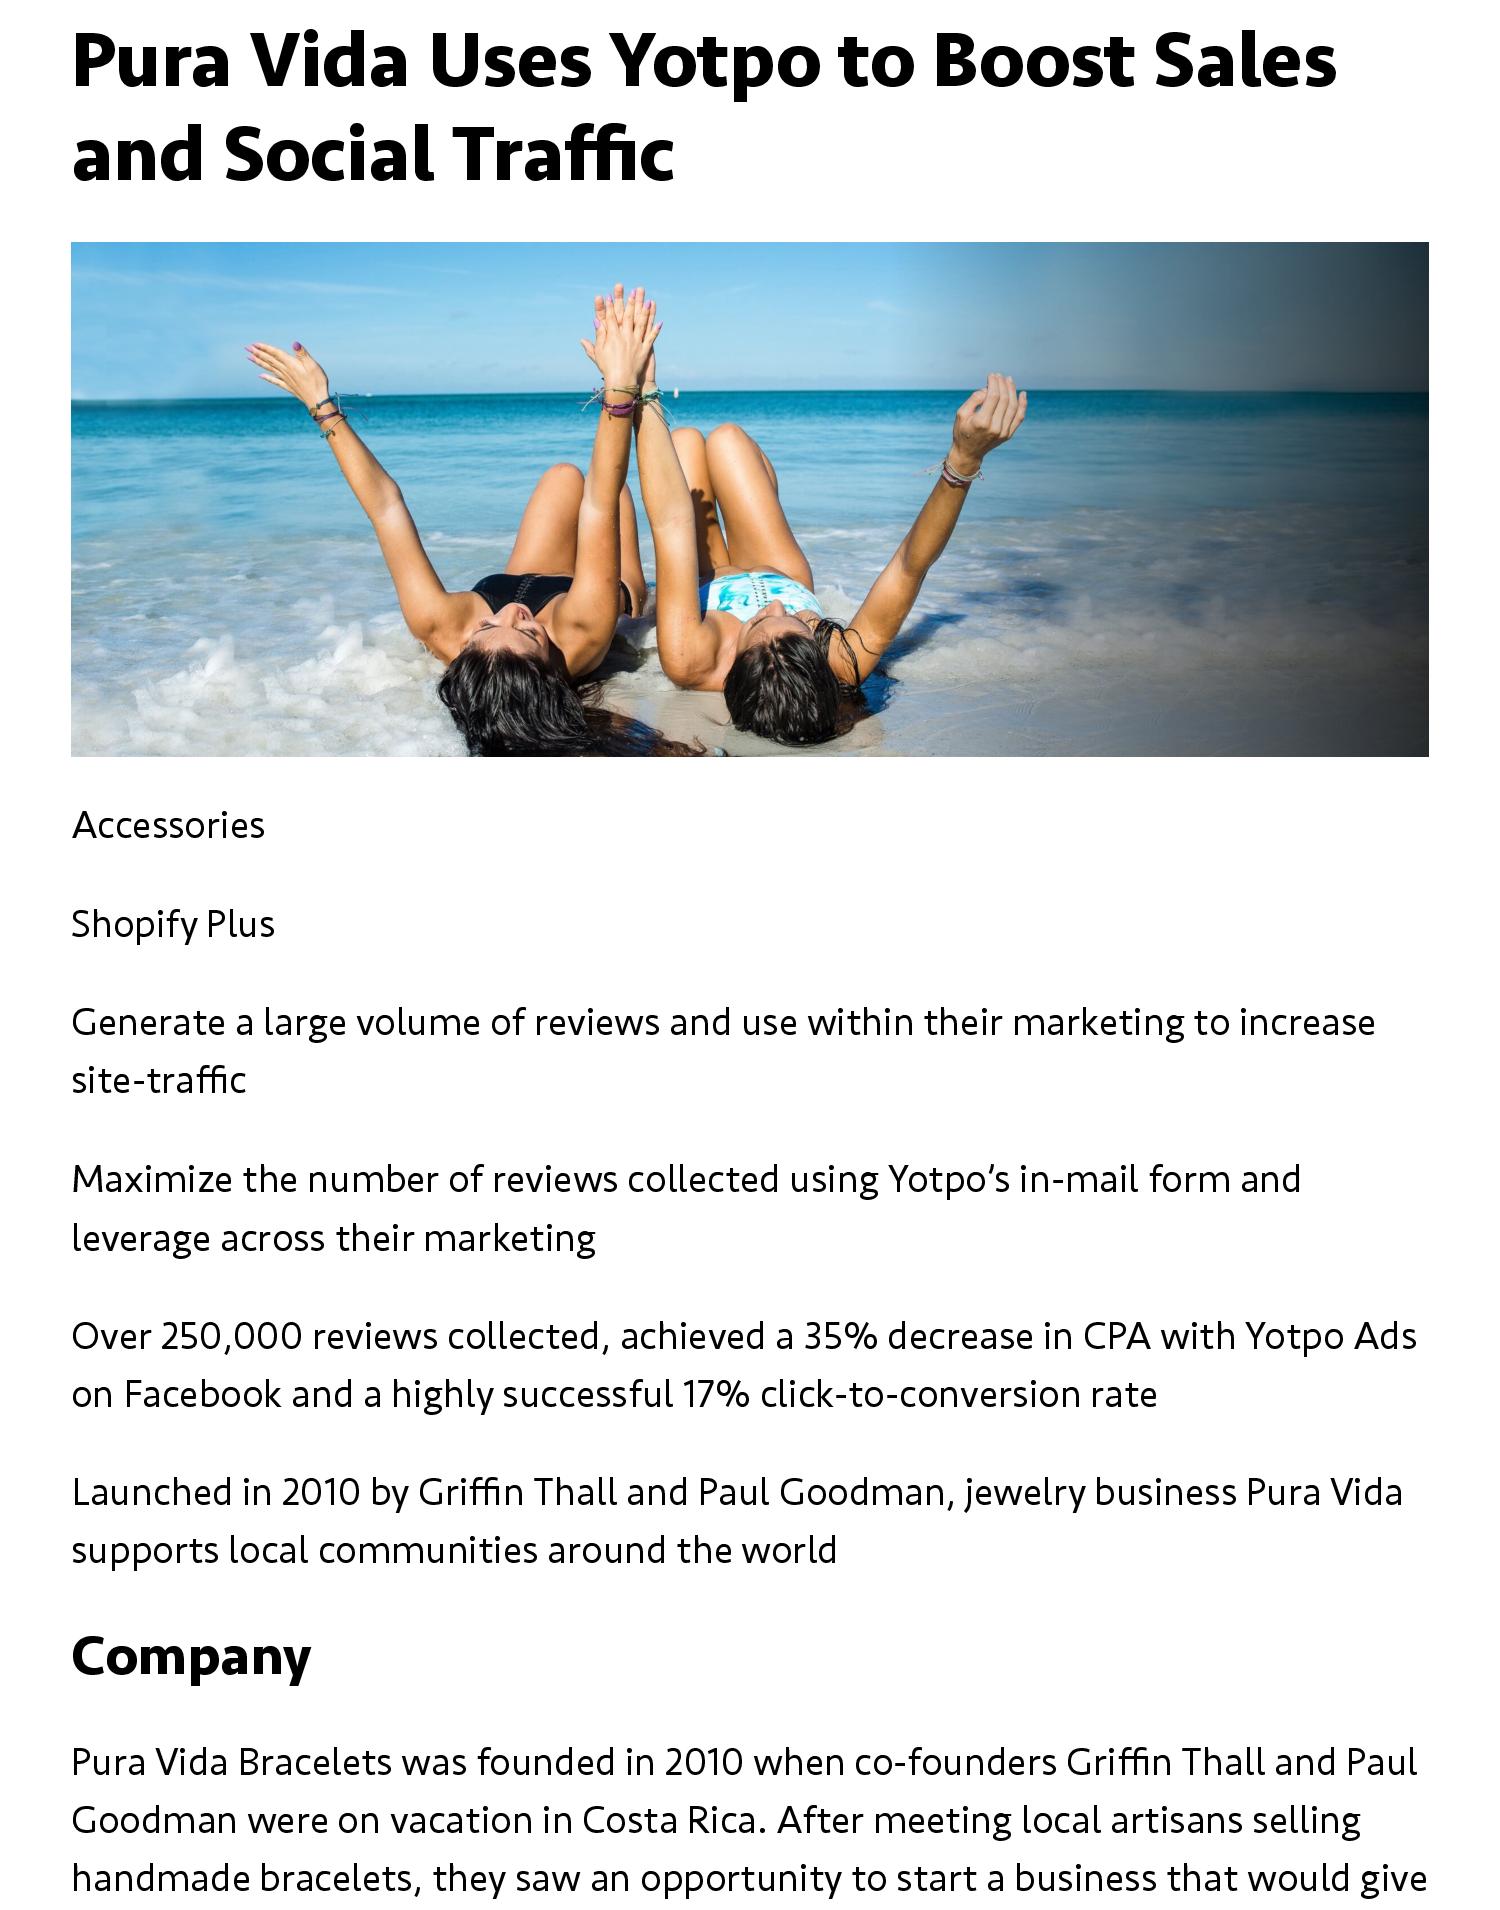 Pura Vida Uses Yotpo to Boost Sales and Social Traffic